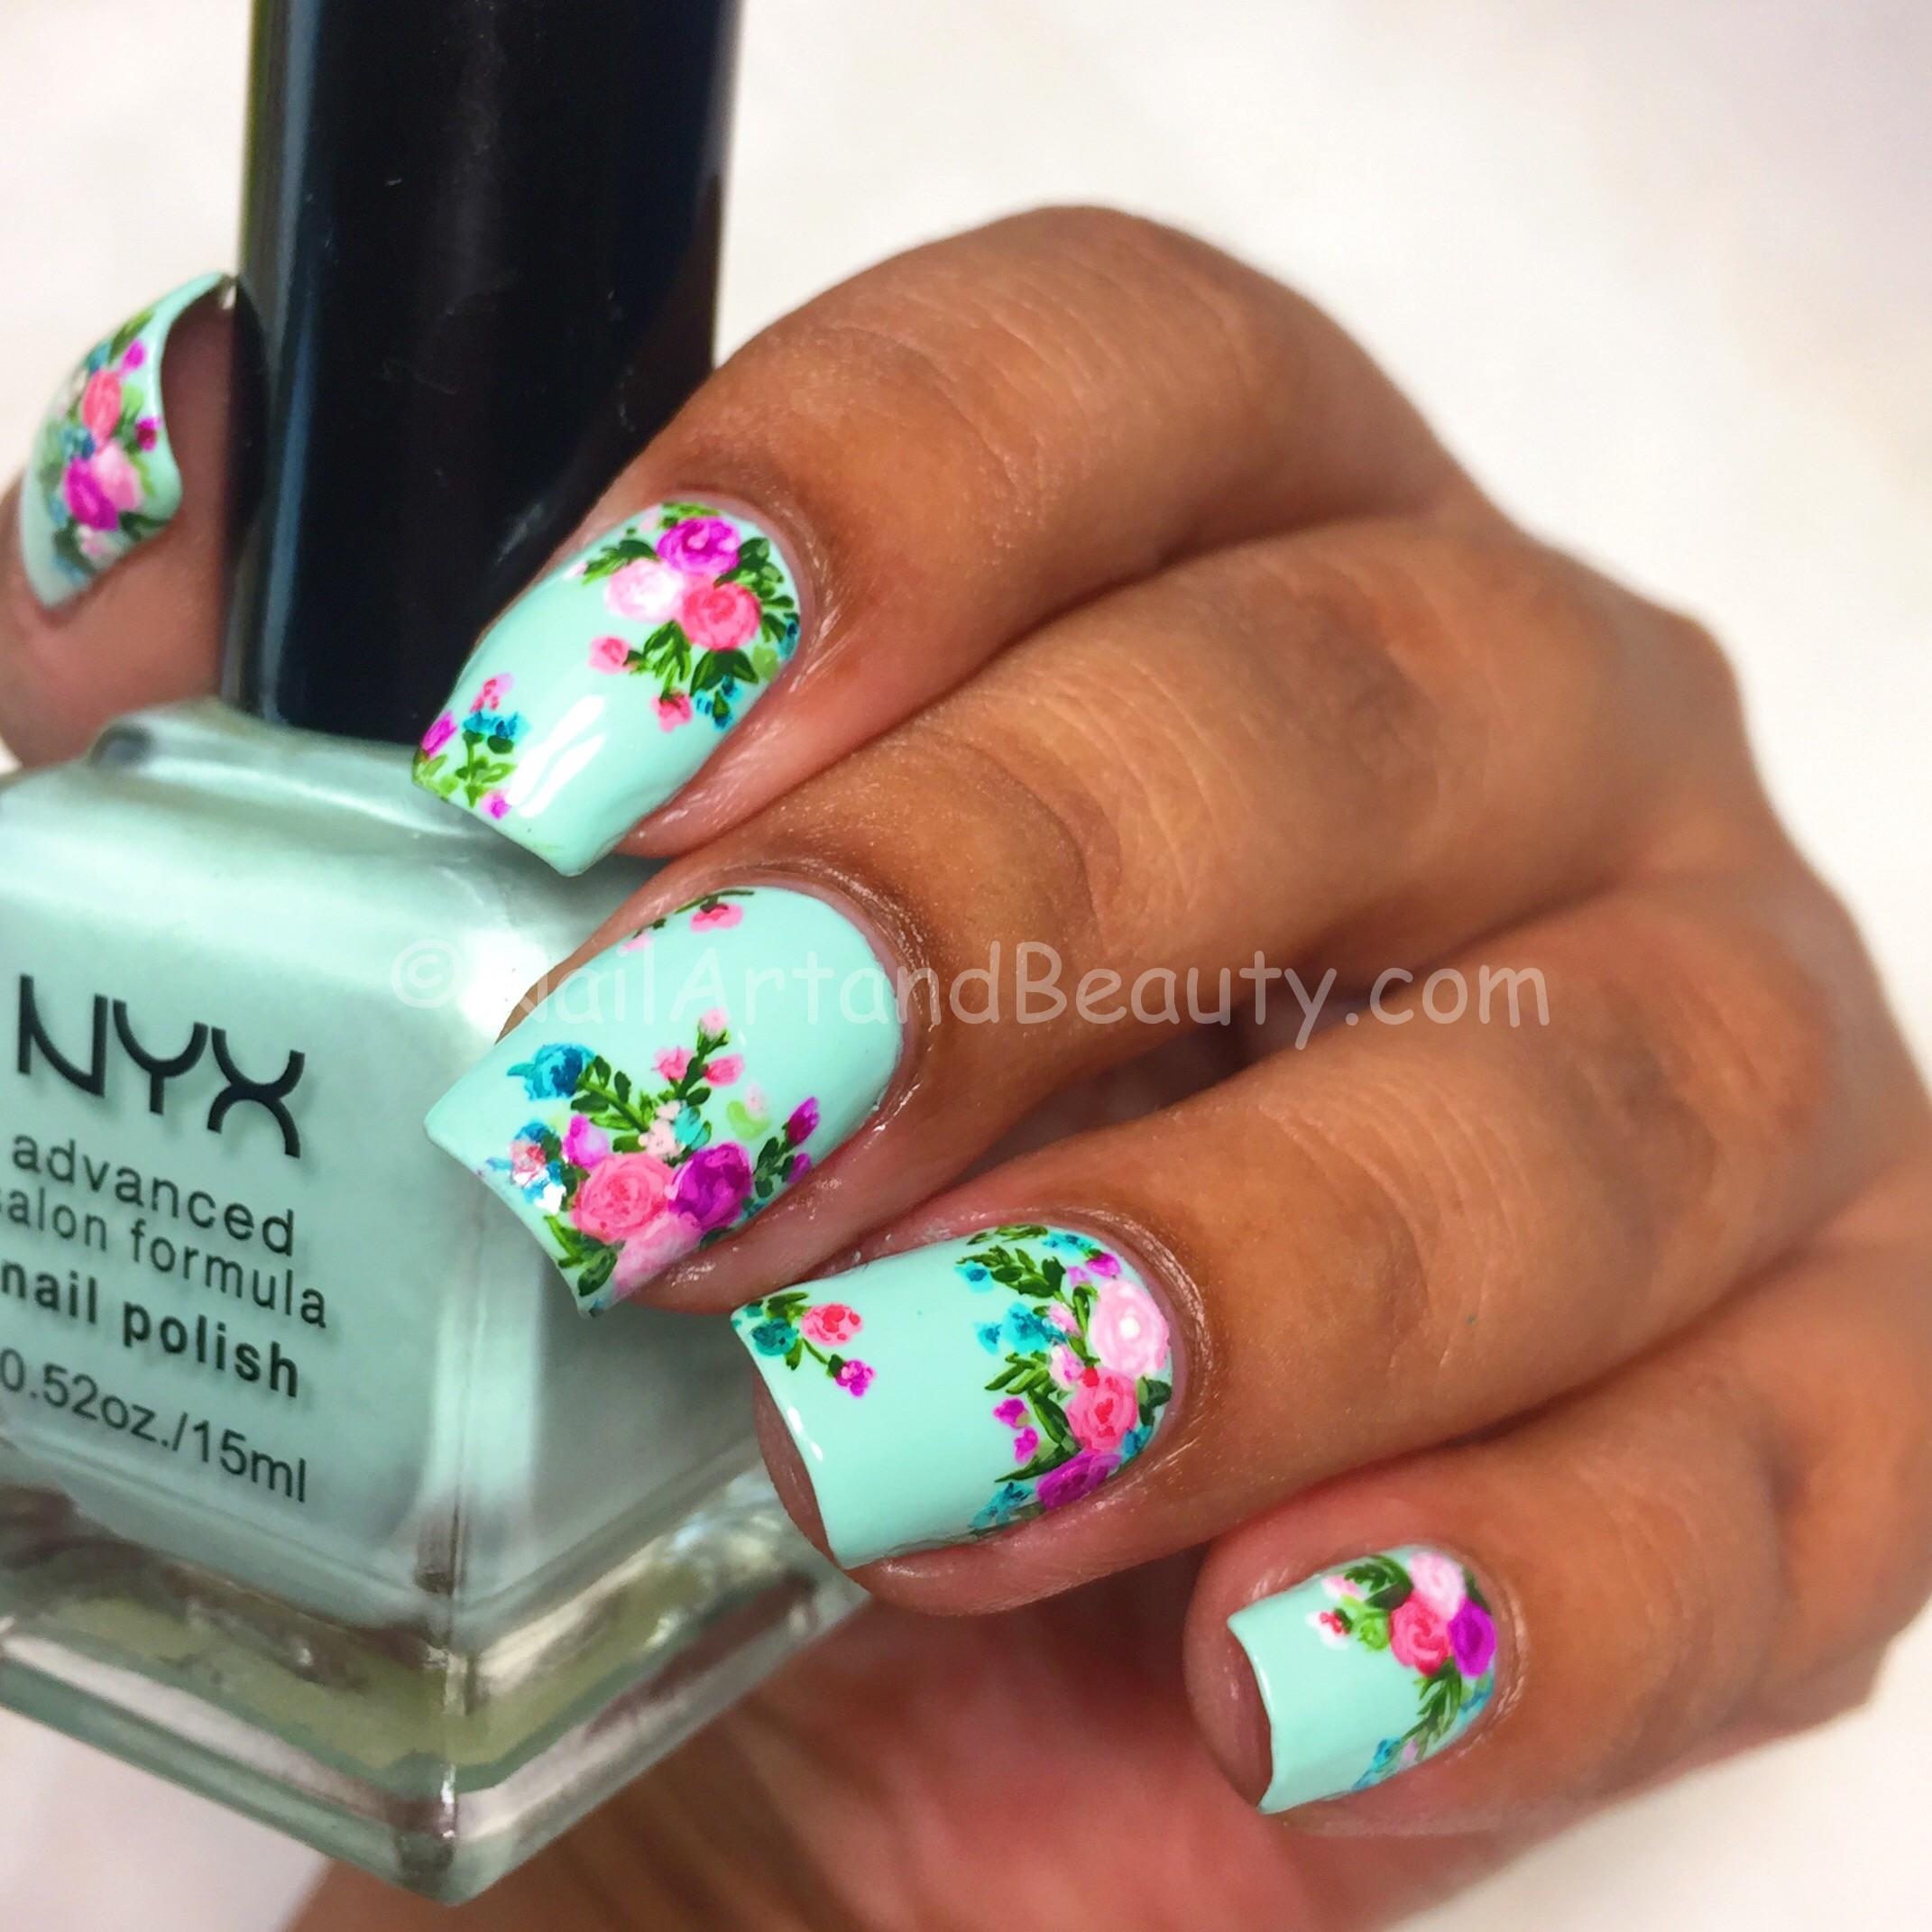 Wallpaper Inspired Nails